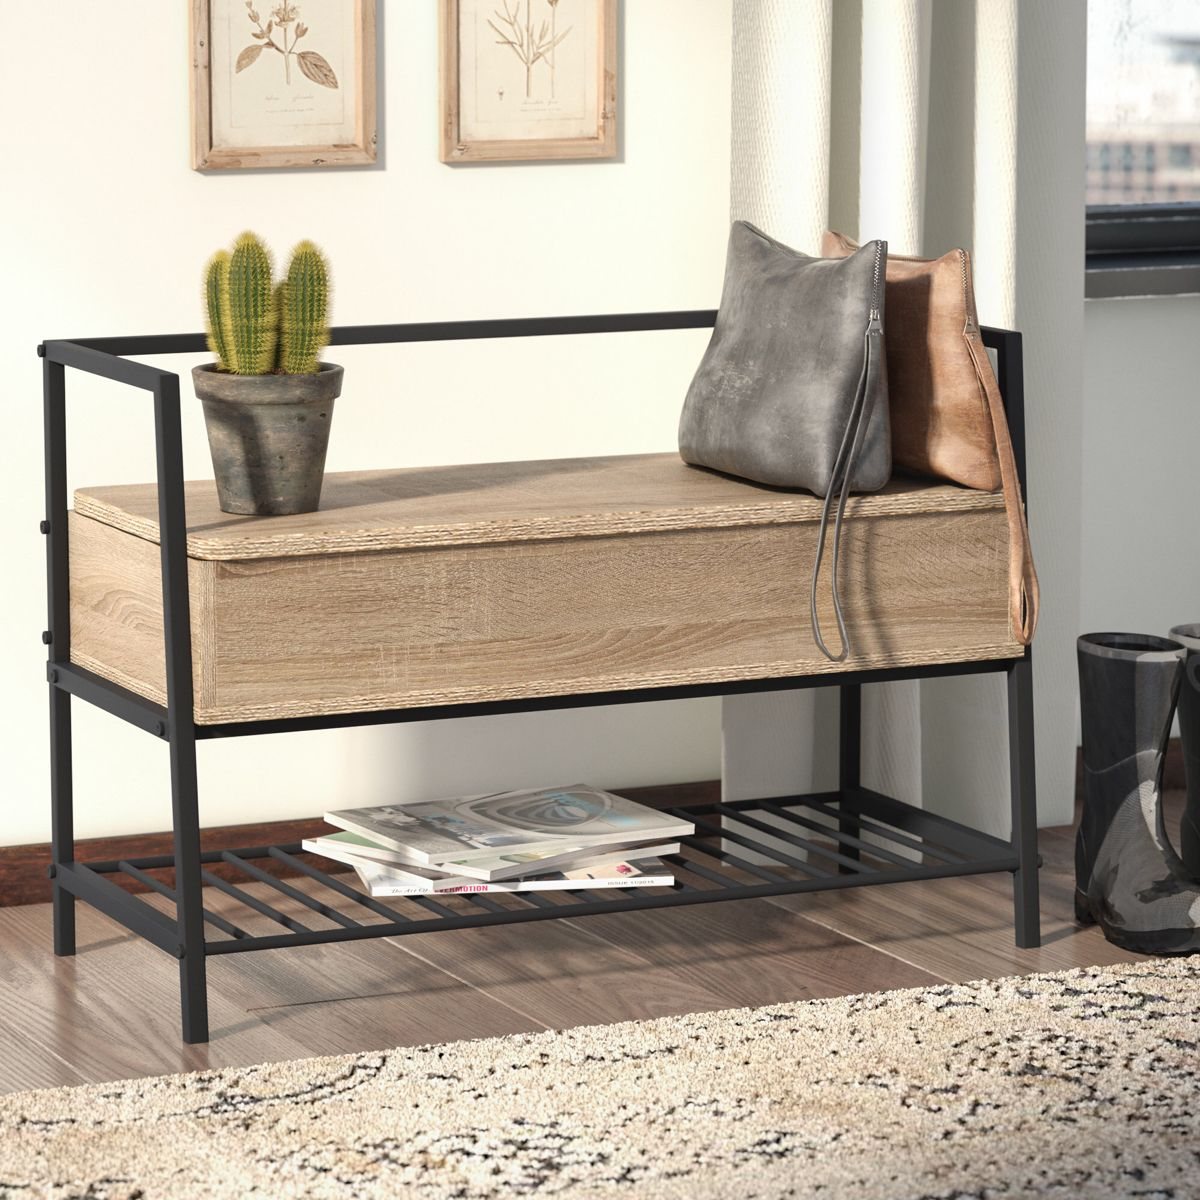 Ermont Cubby Storage Bench | Cubby storage bench, Bench ...